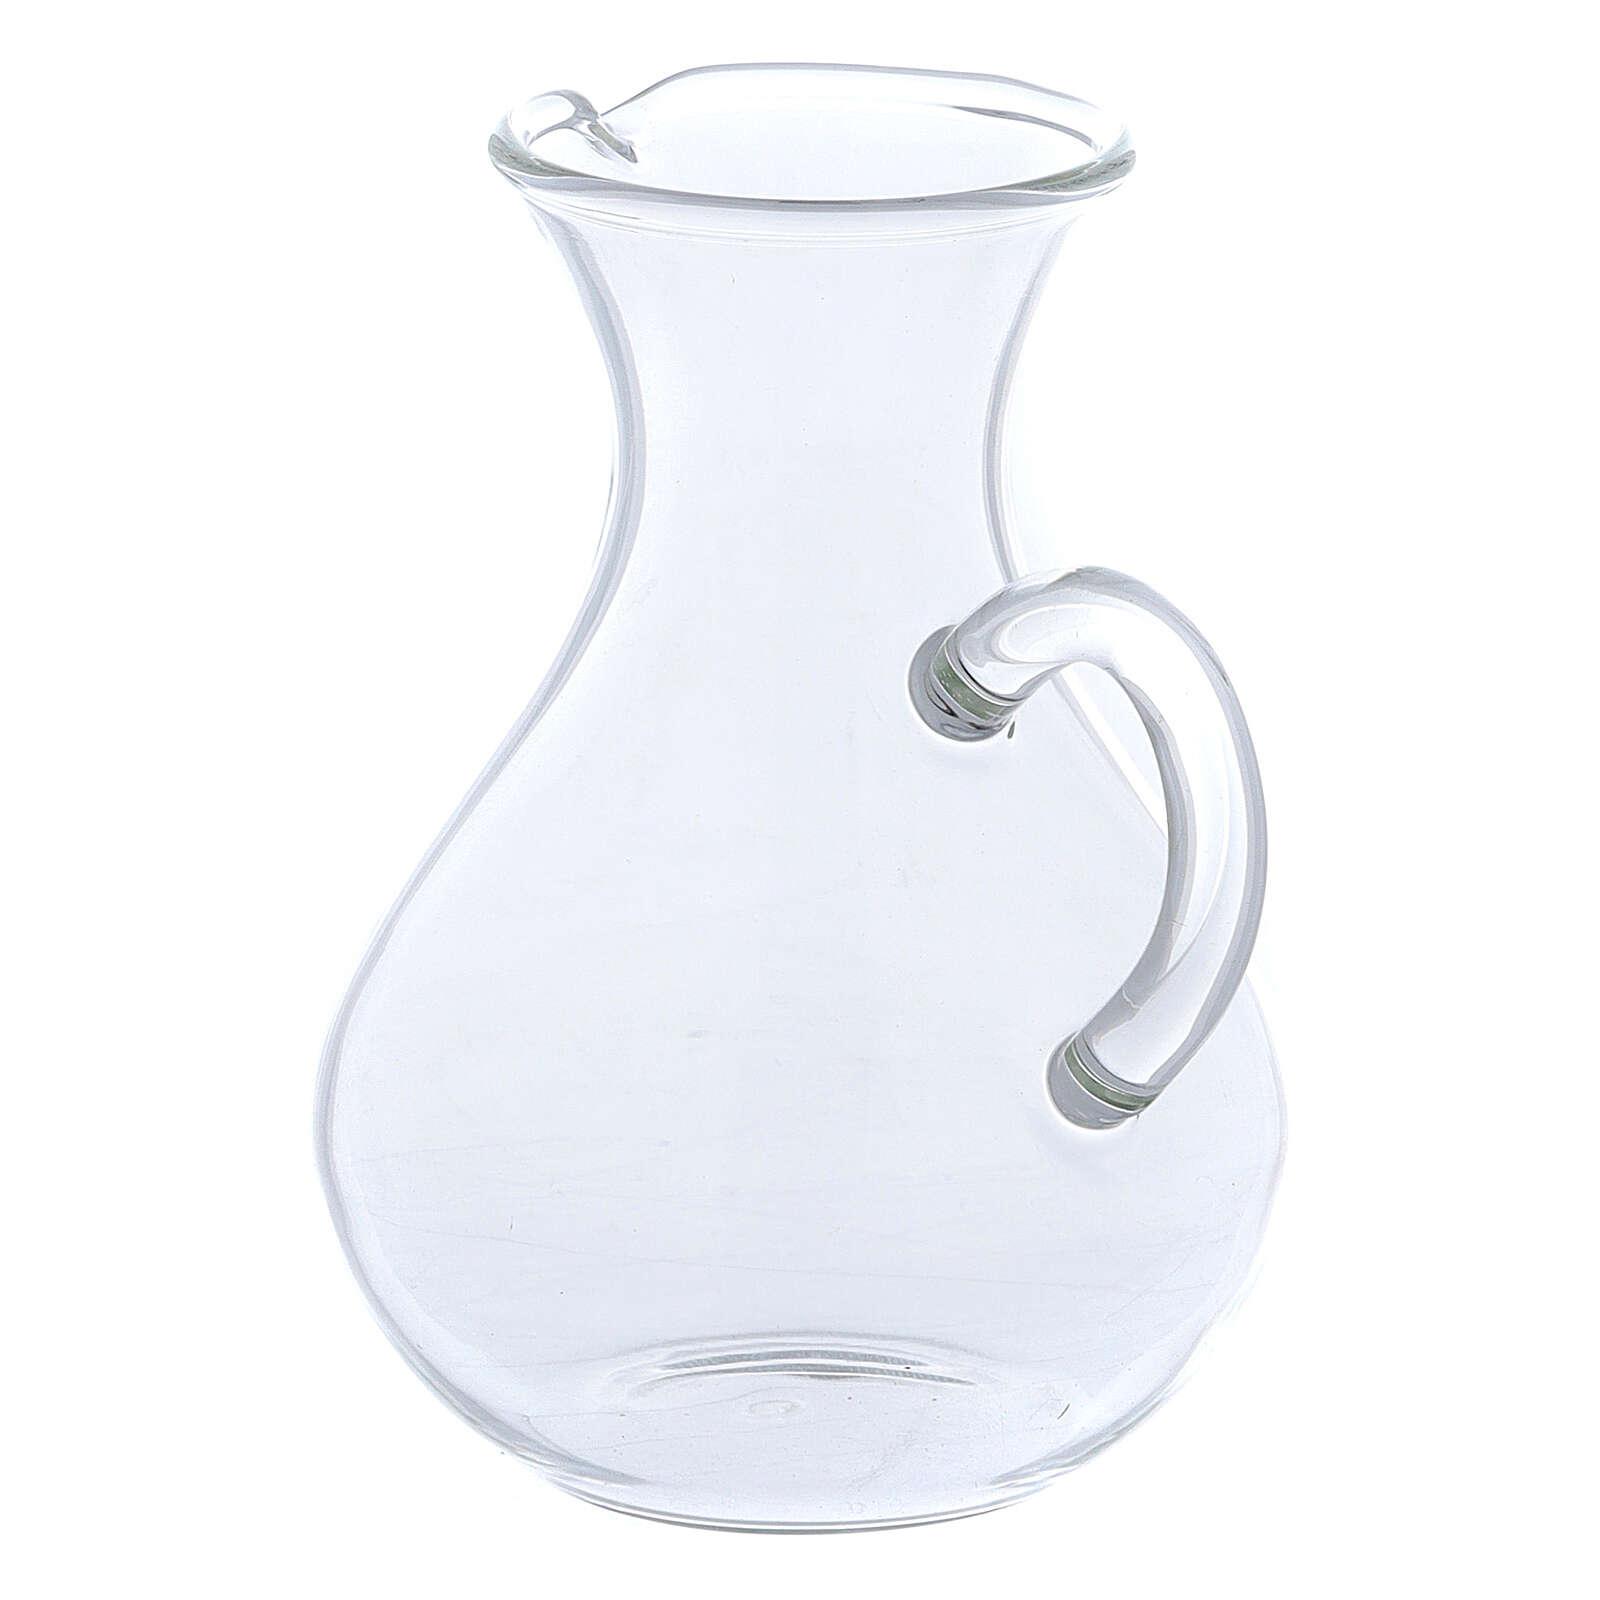 Ewer in glass Roma model 130 ml, 2 pcs 4